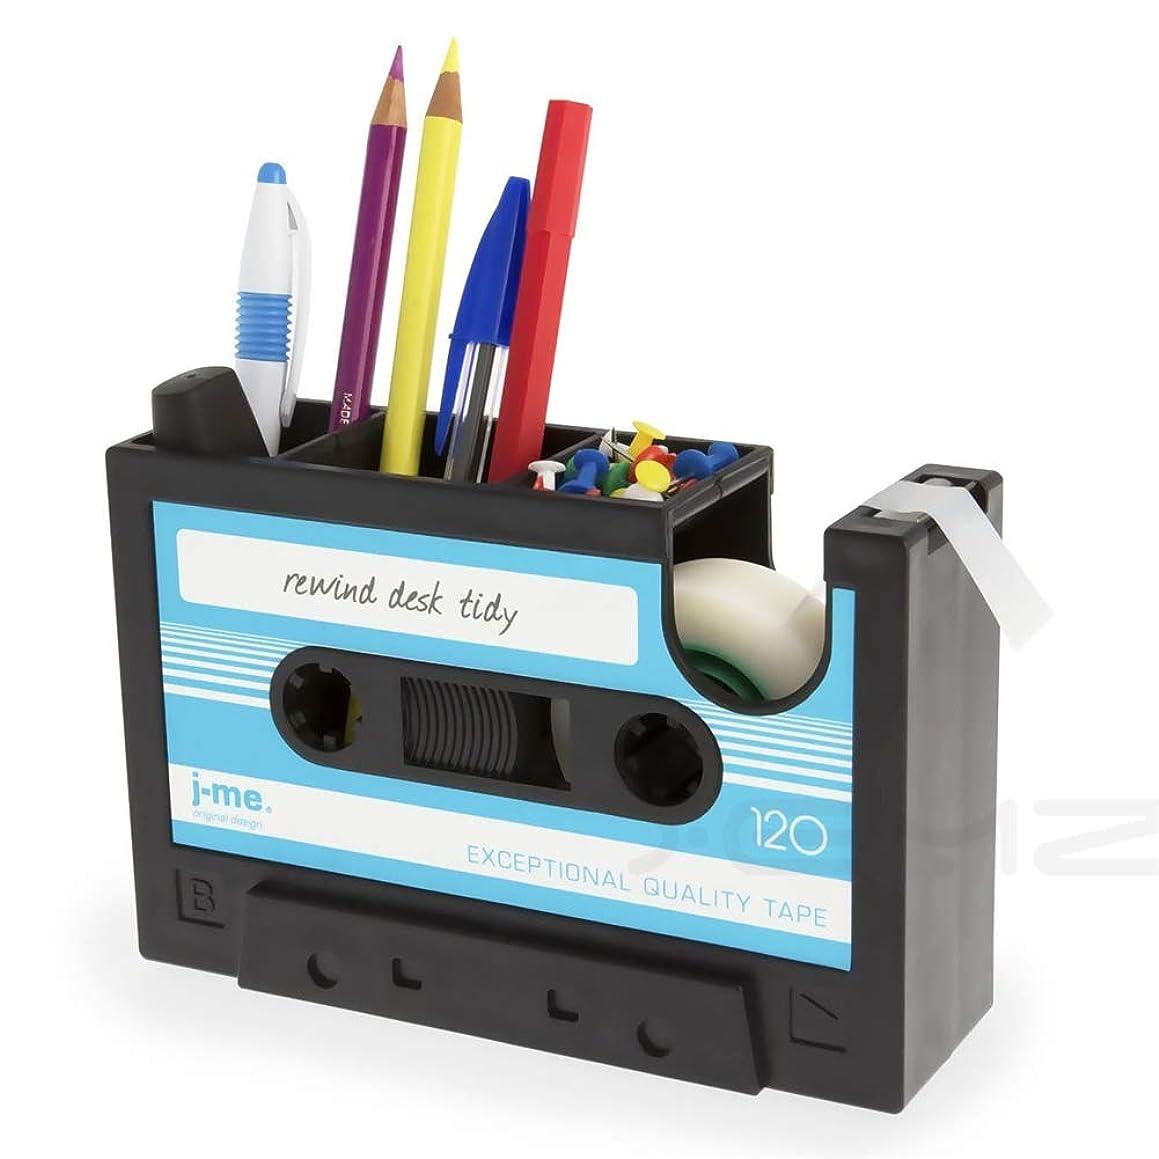 Creative Adhesive Tape Pen Holder Case, Retro Cassette Tape Dispenser Vase Brush Pot, Popular Pencil Desk Collection Tidy Organizer, Office Stationery Storage Container- Unique Gift (Blue)